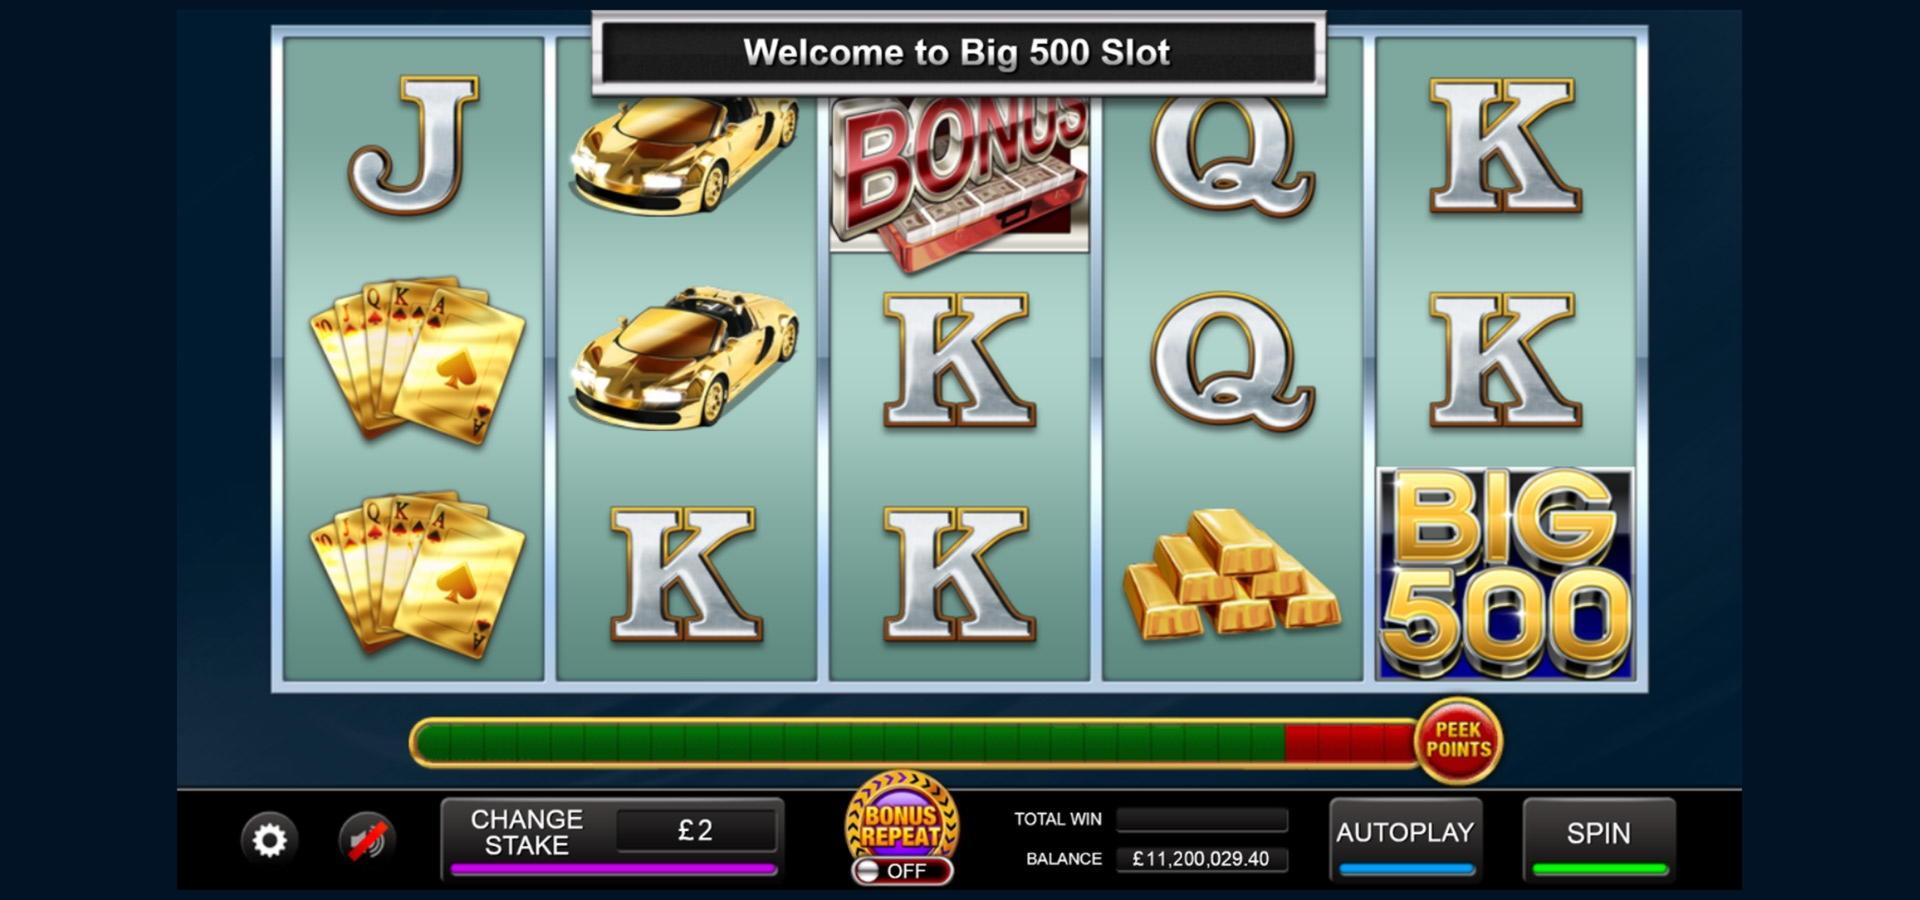 50 Gratis Casino Spins am Blighty Bingo